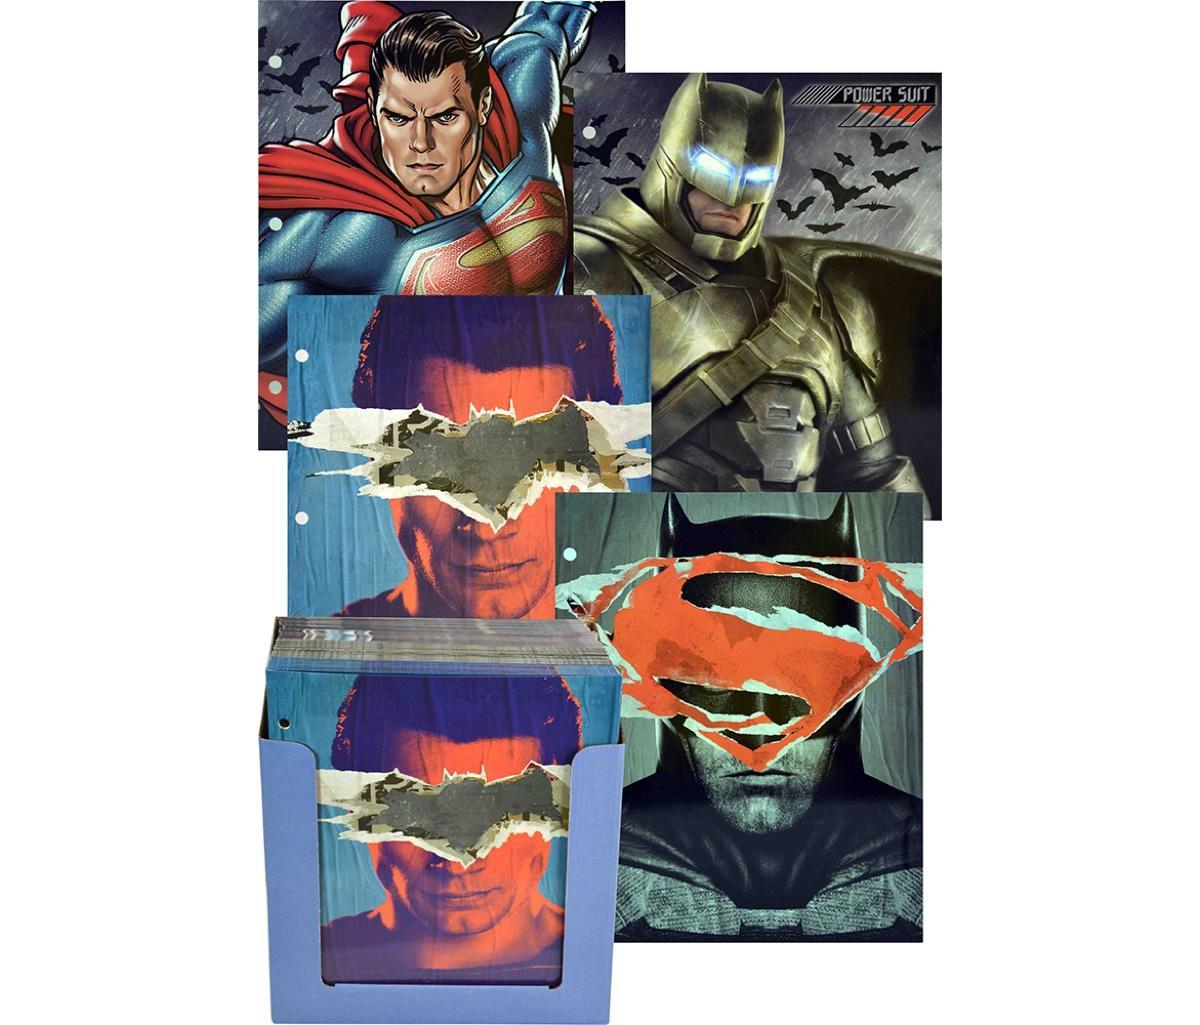 Novelty Character School Supplies DC Comics Batman V Superman Paper Portfolio Folders, Colors May Vary (2pc Set)